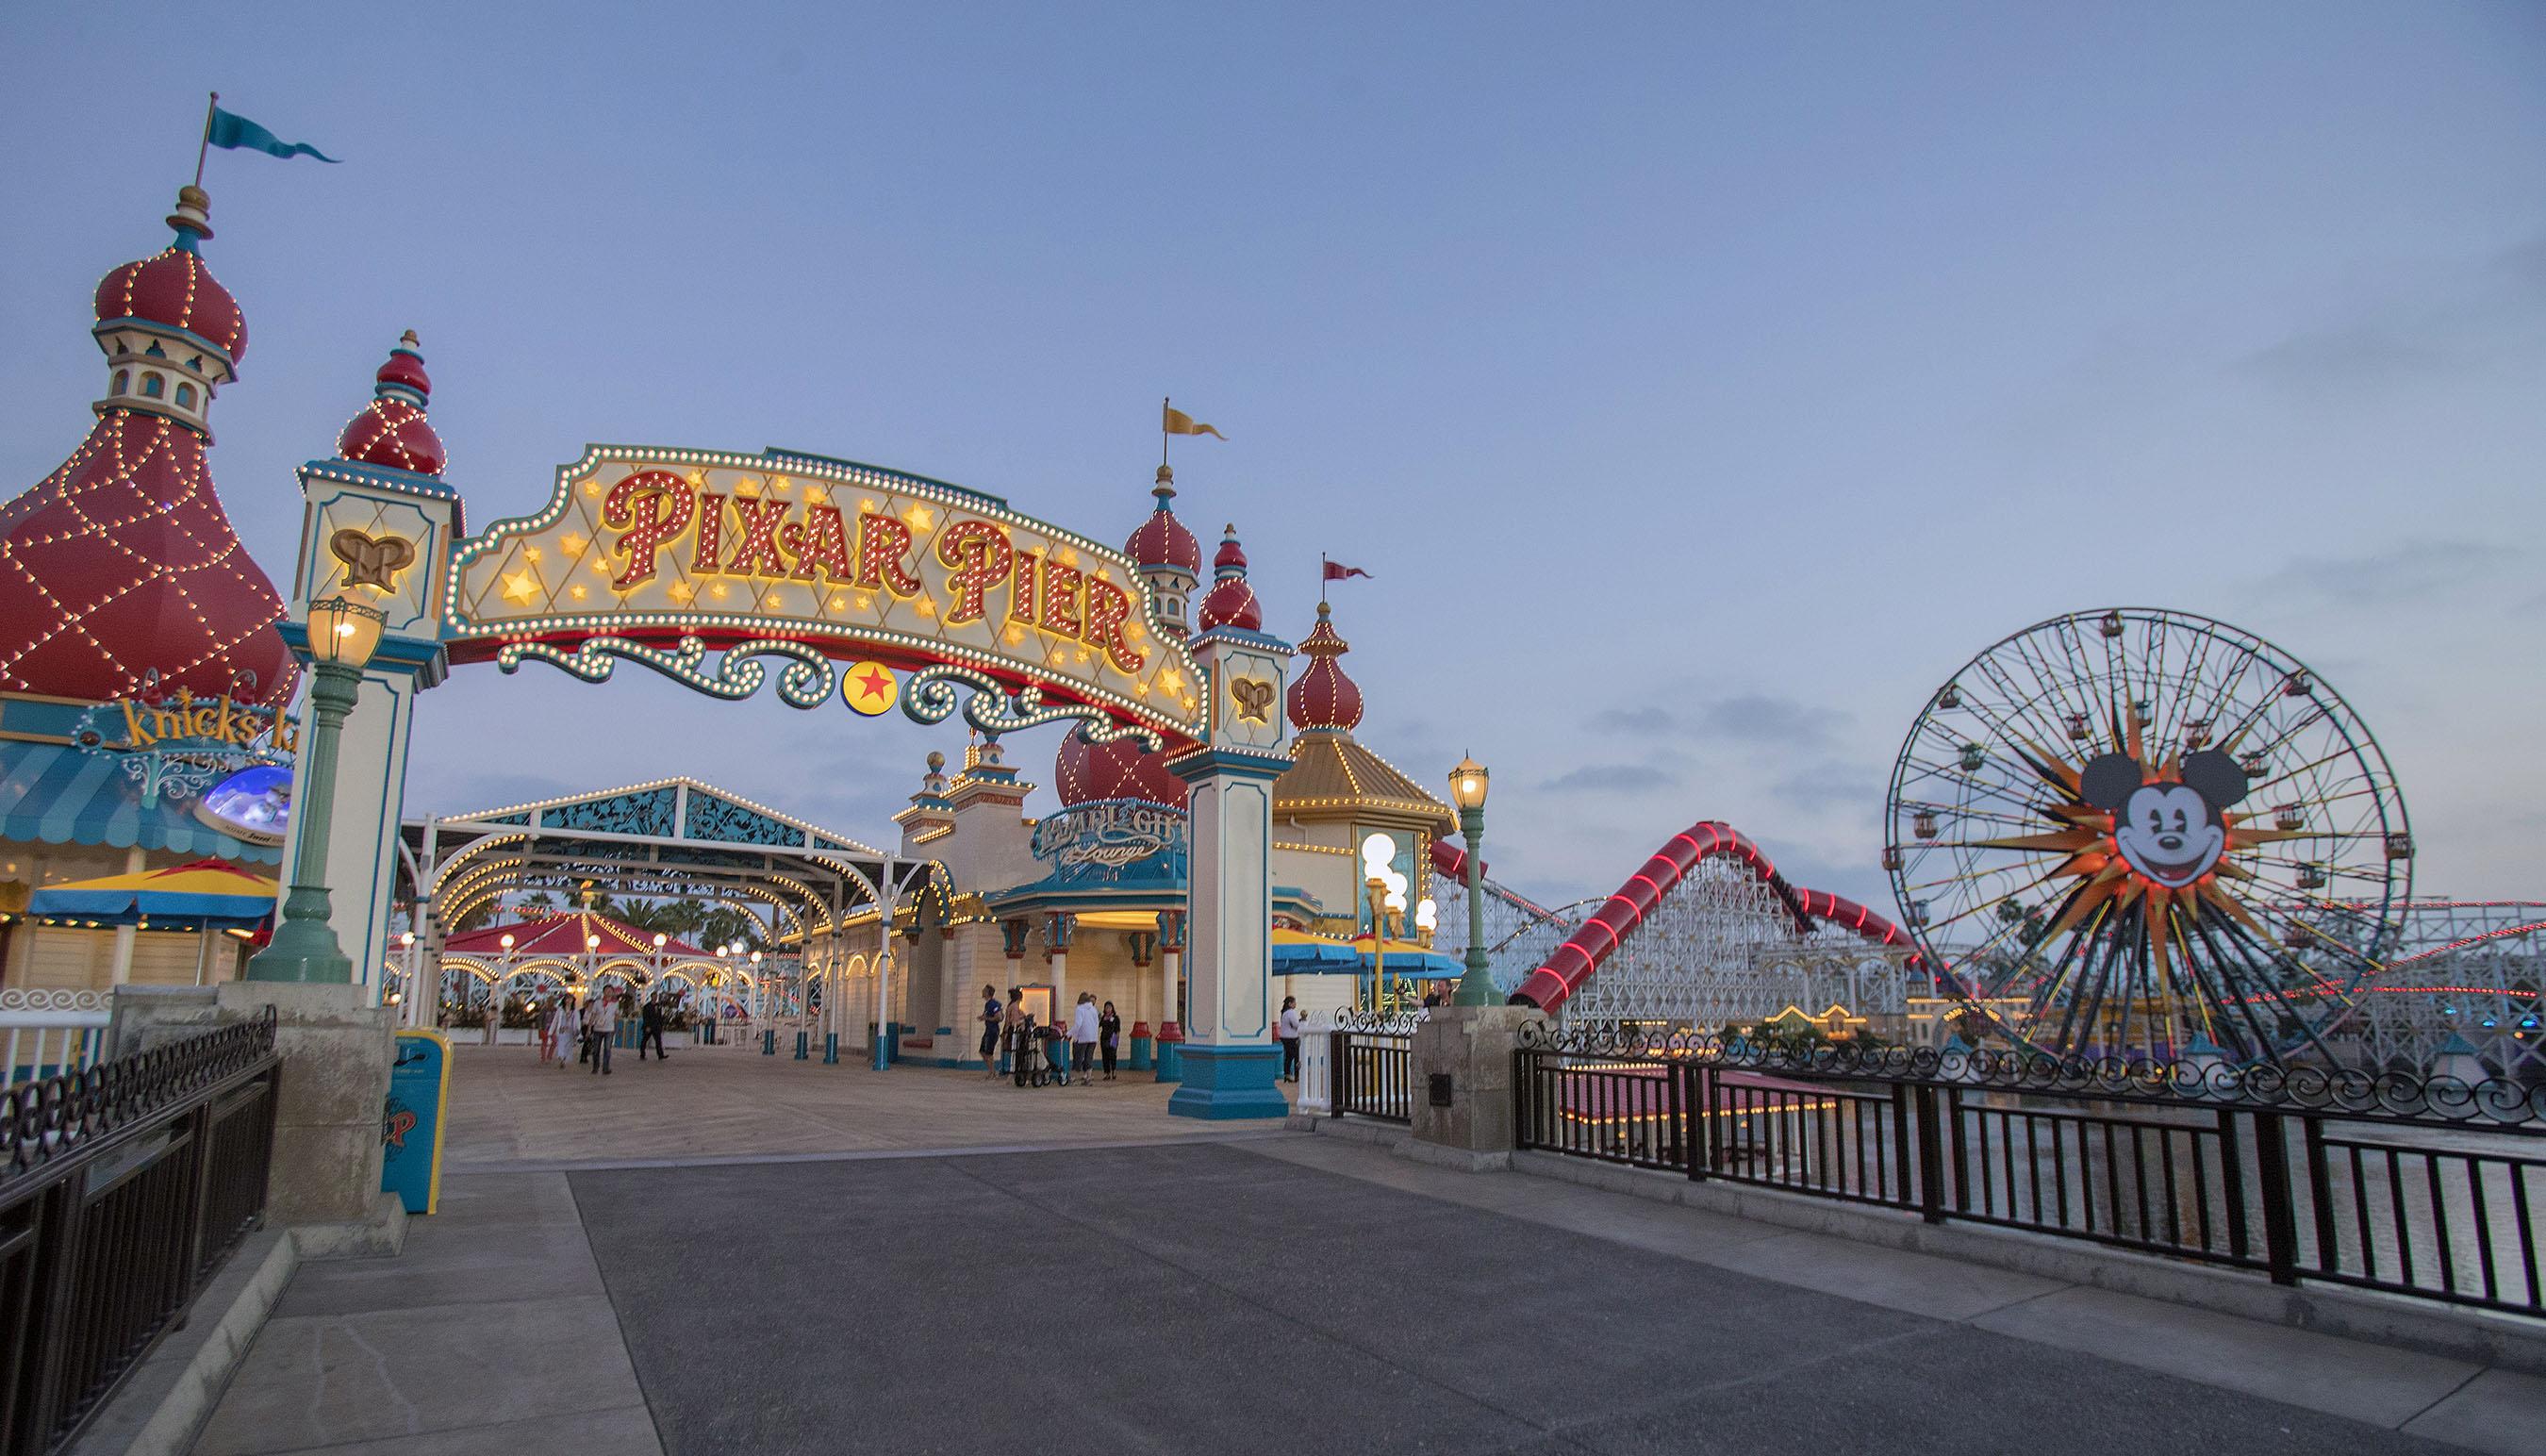 Disneyland Resort Presents Pixar Pier Where Guests Step into Beloved Pixar Stories at Disney California Adventure Park